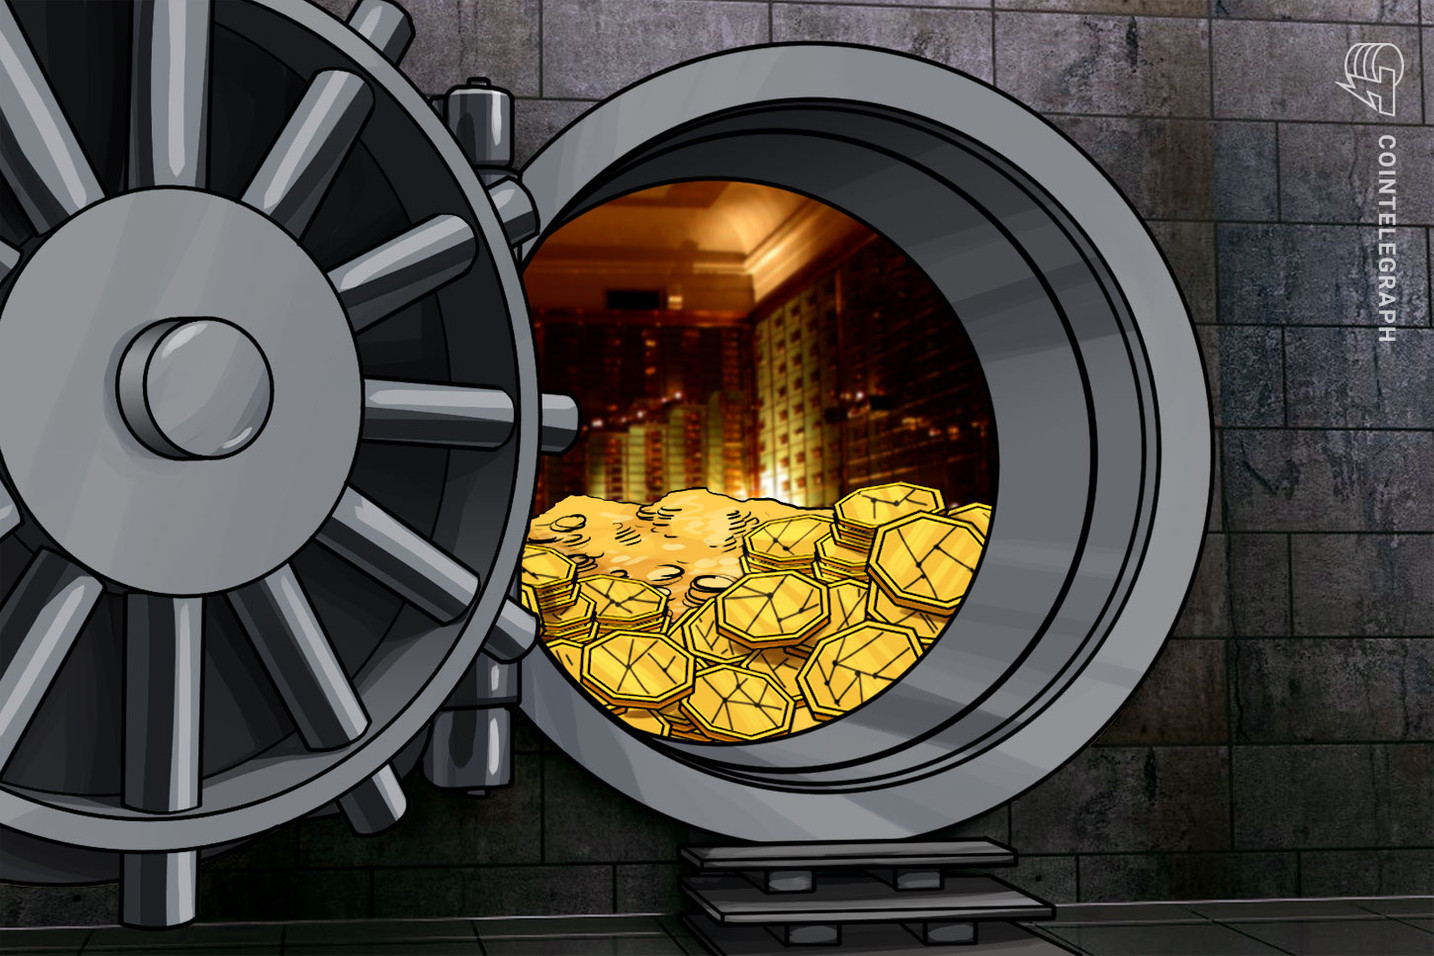 Gemini exchange's crypto custody doubled since January, reaching $25B